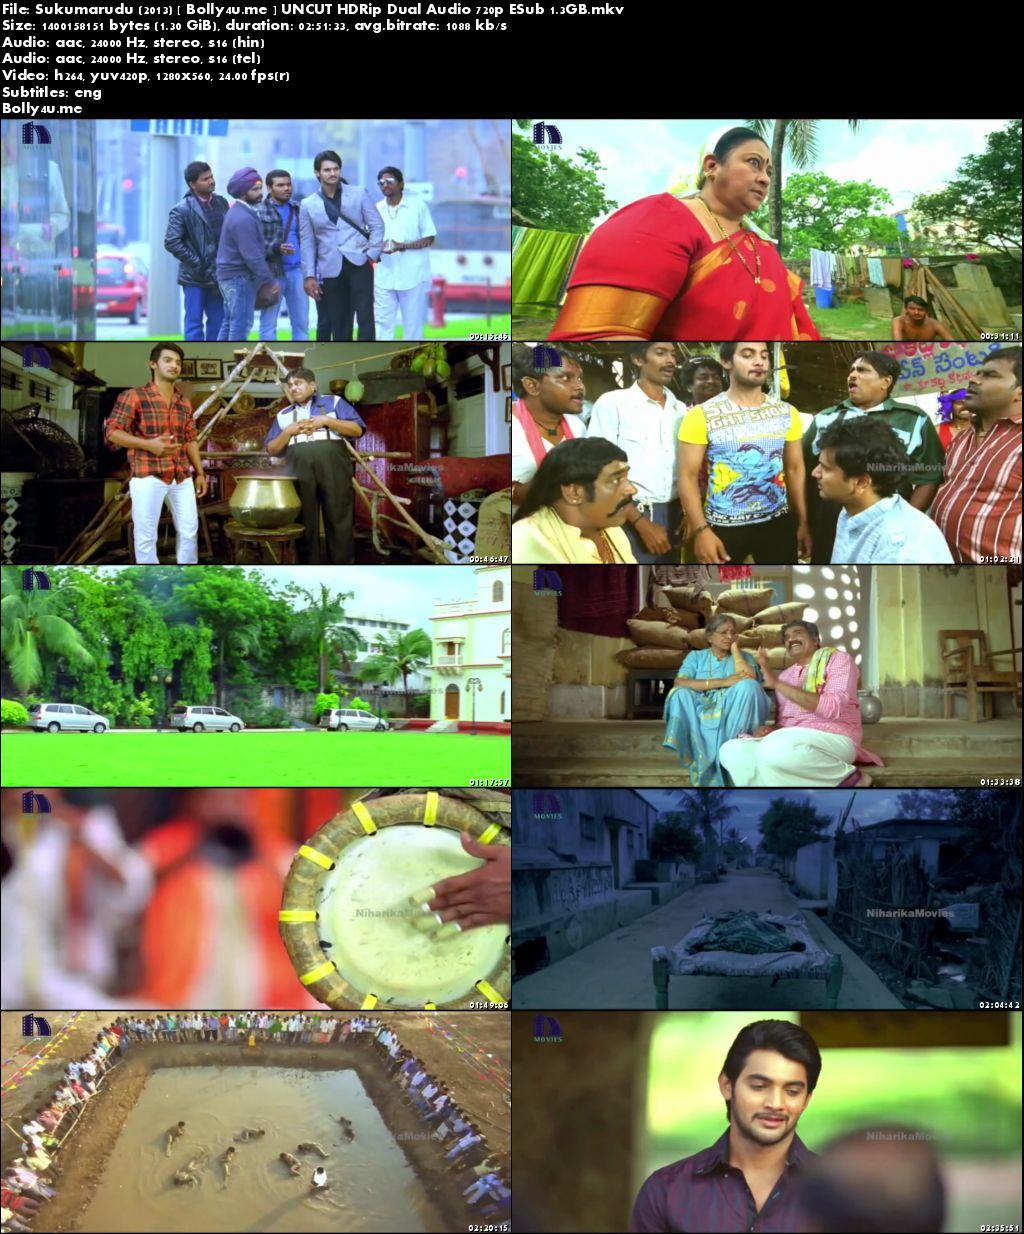 Sukumarudu 2013 HDRip UNCUT Hindi Dubbed Dual Audio 720p ESub Download